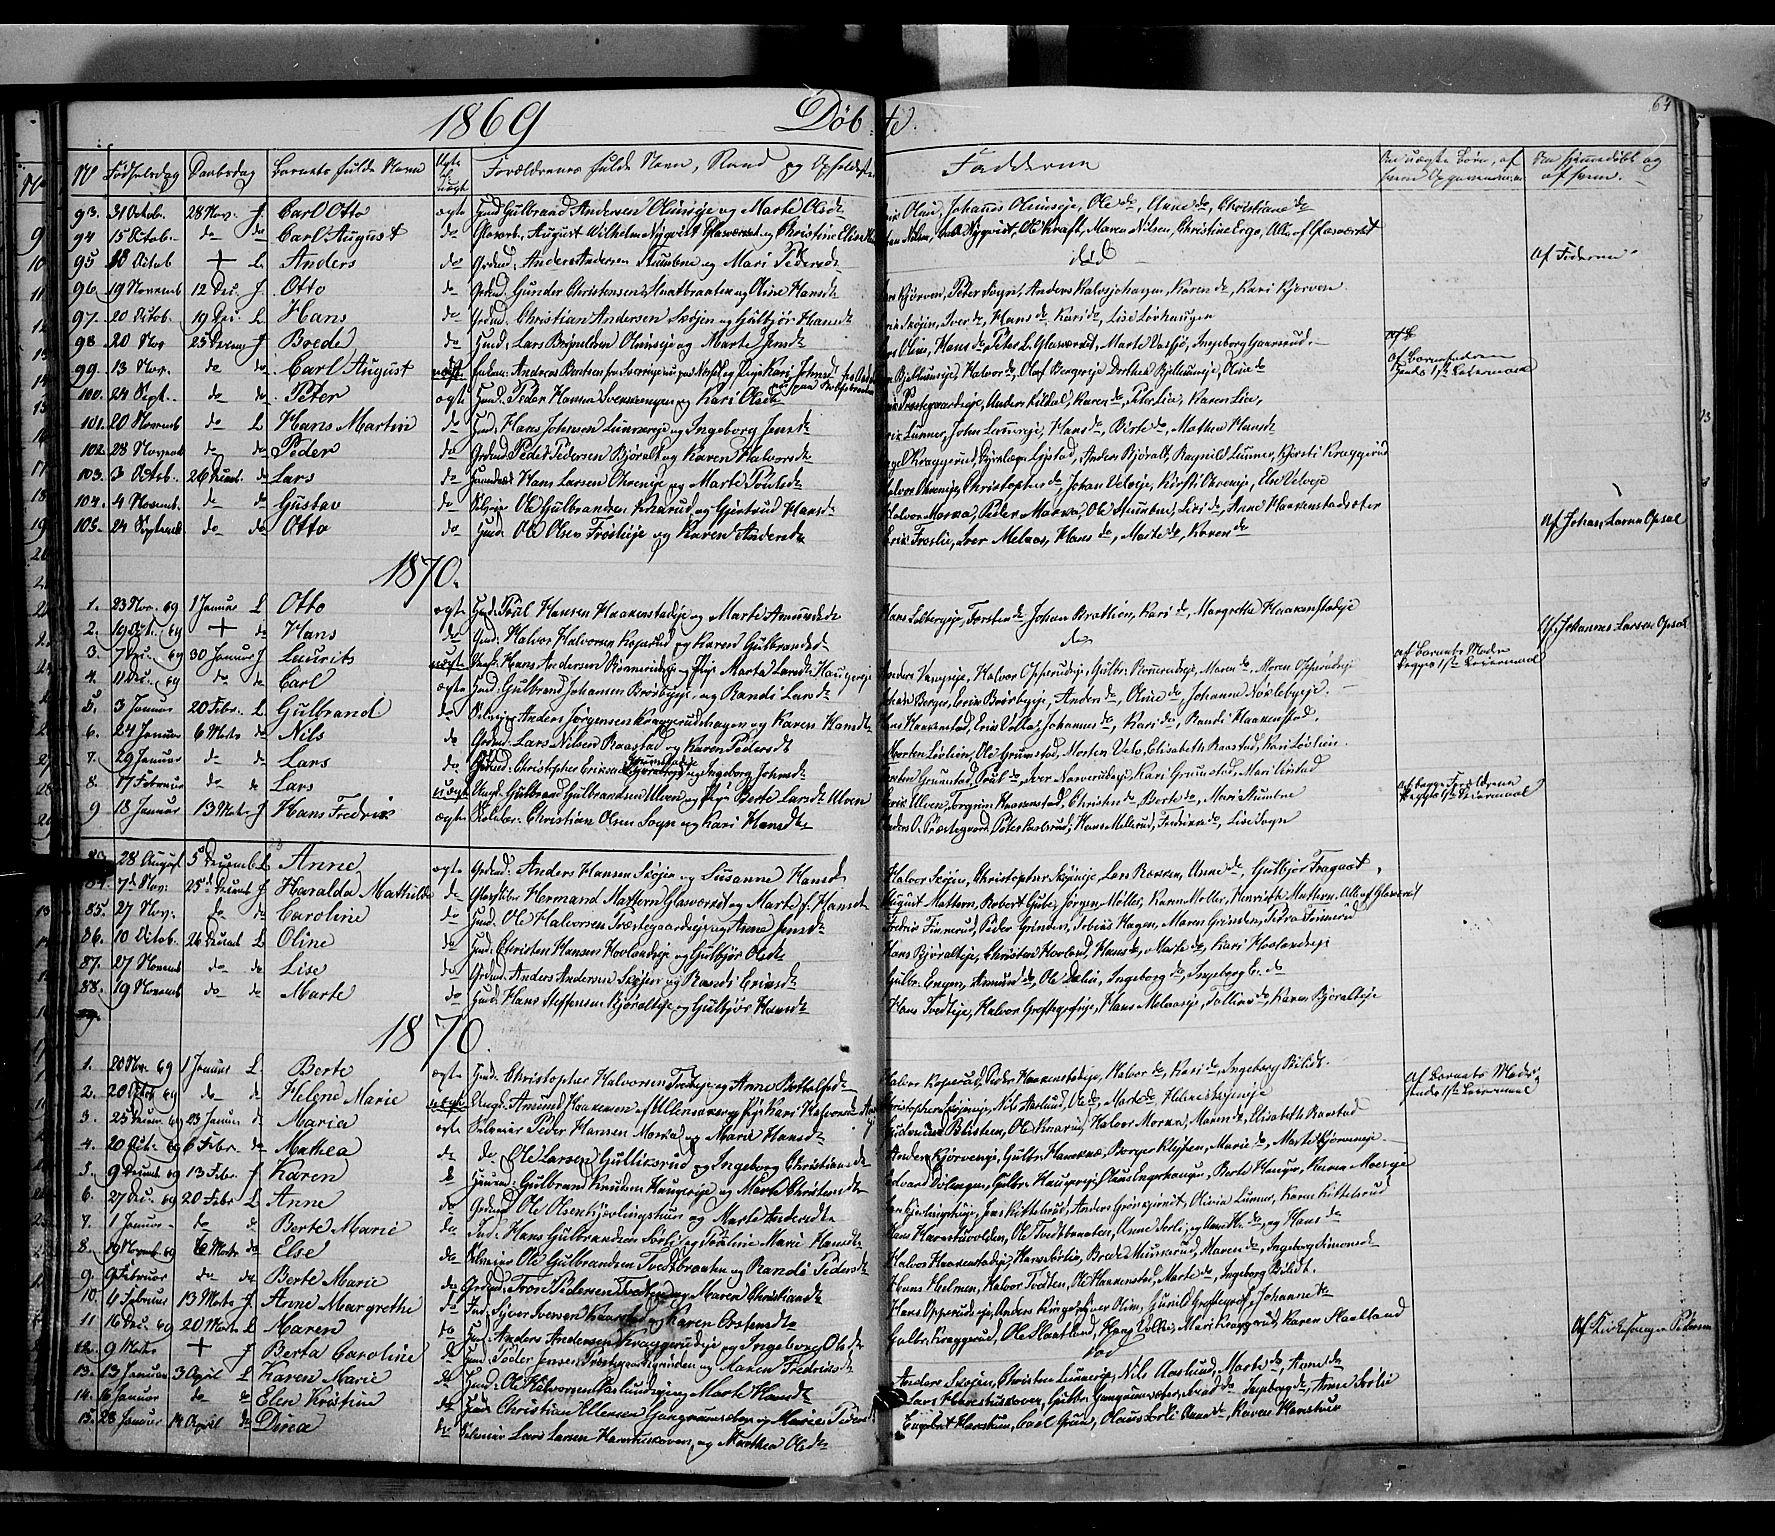 SAH, Jevnaker prestekontor, Ministerialbok nr. 7, 1858-1876, s. 64